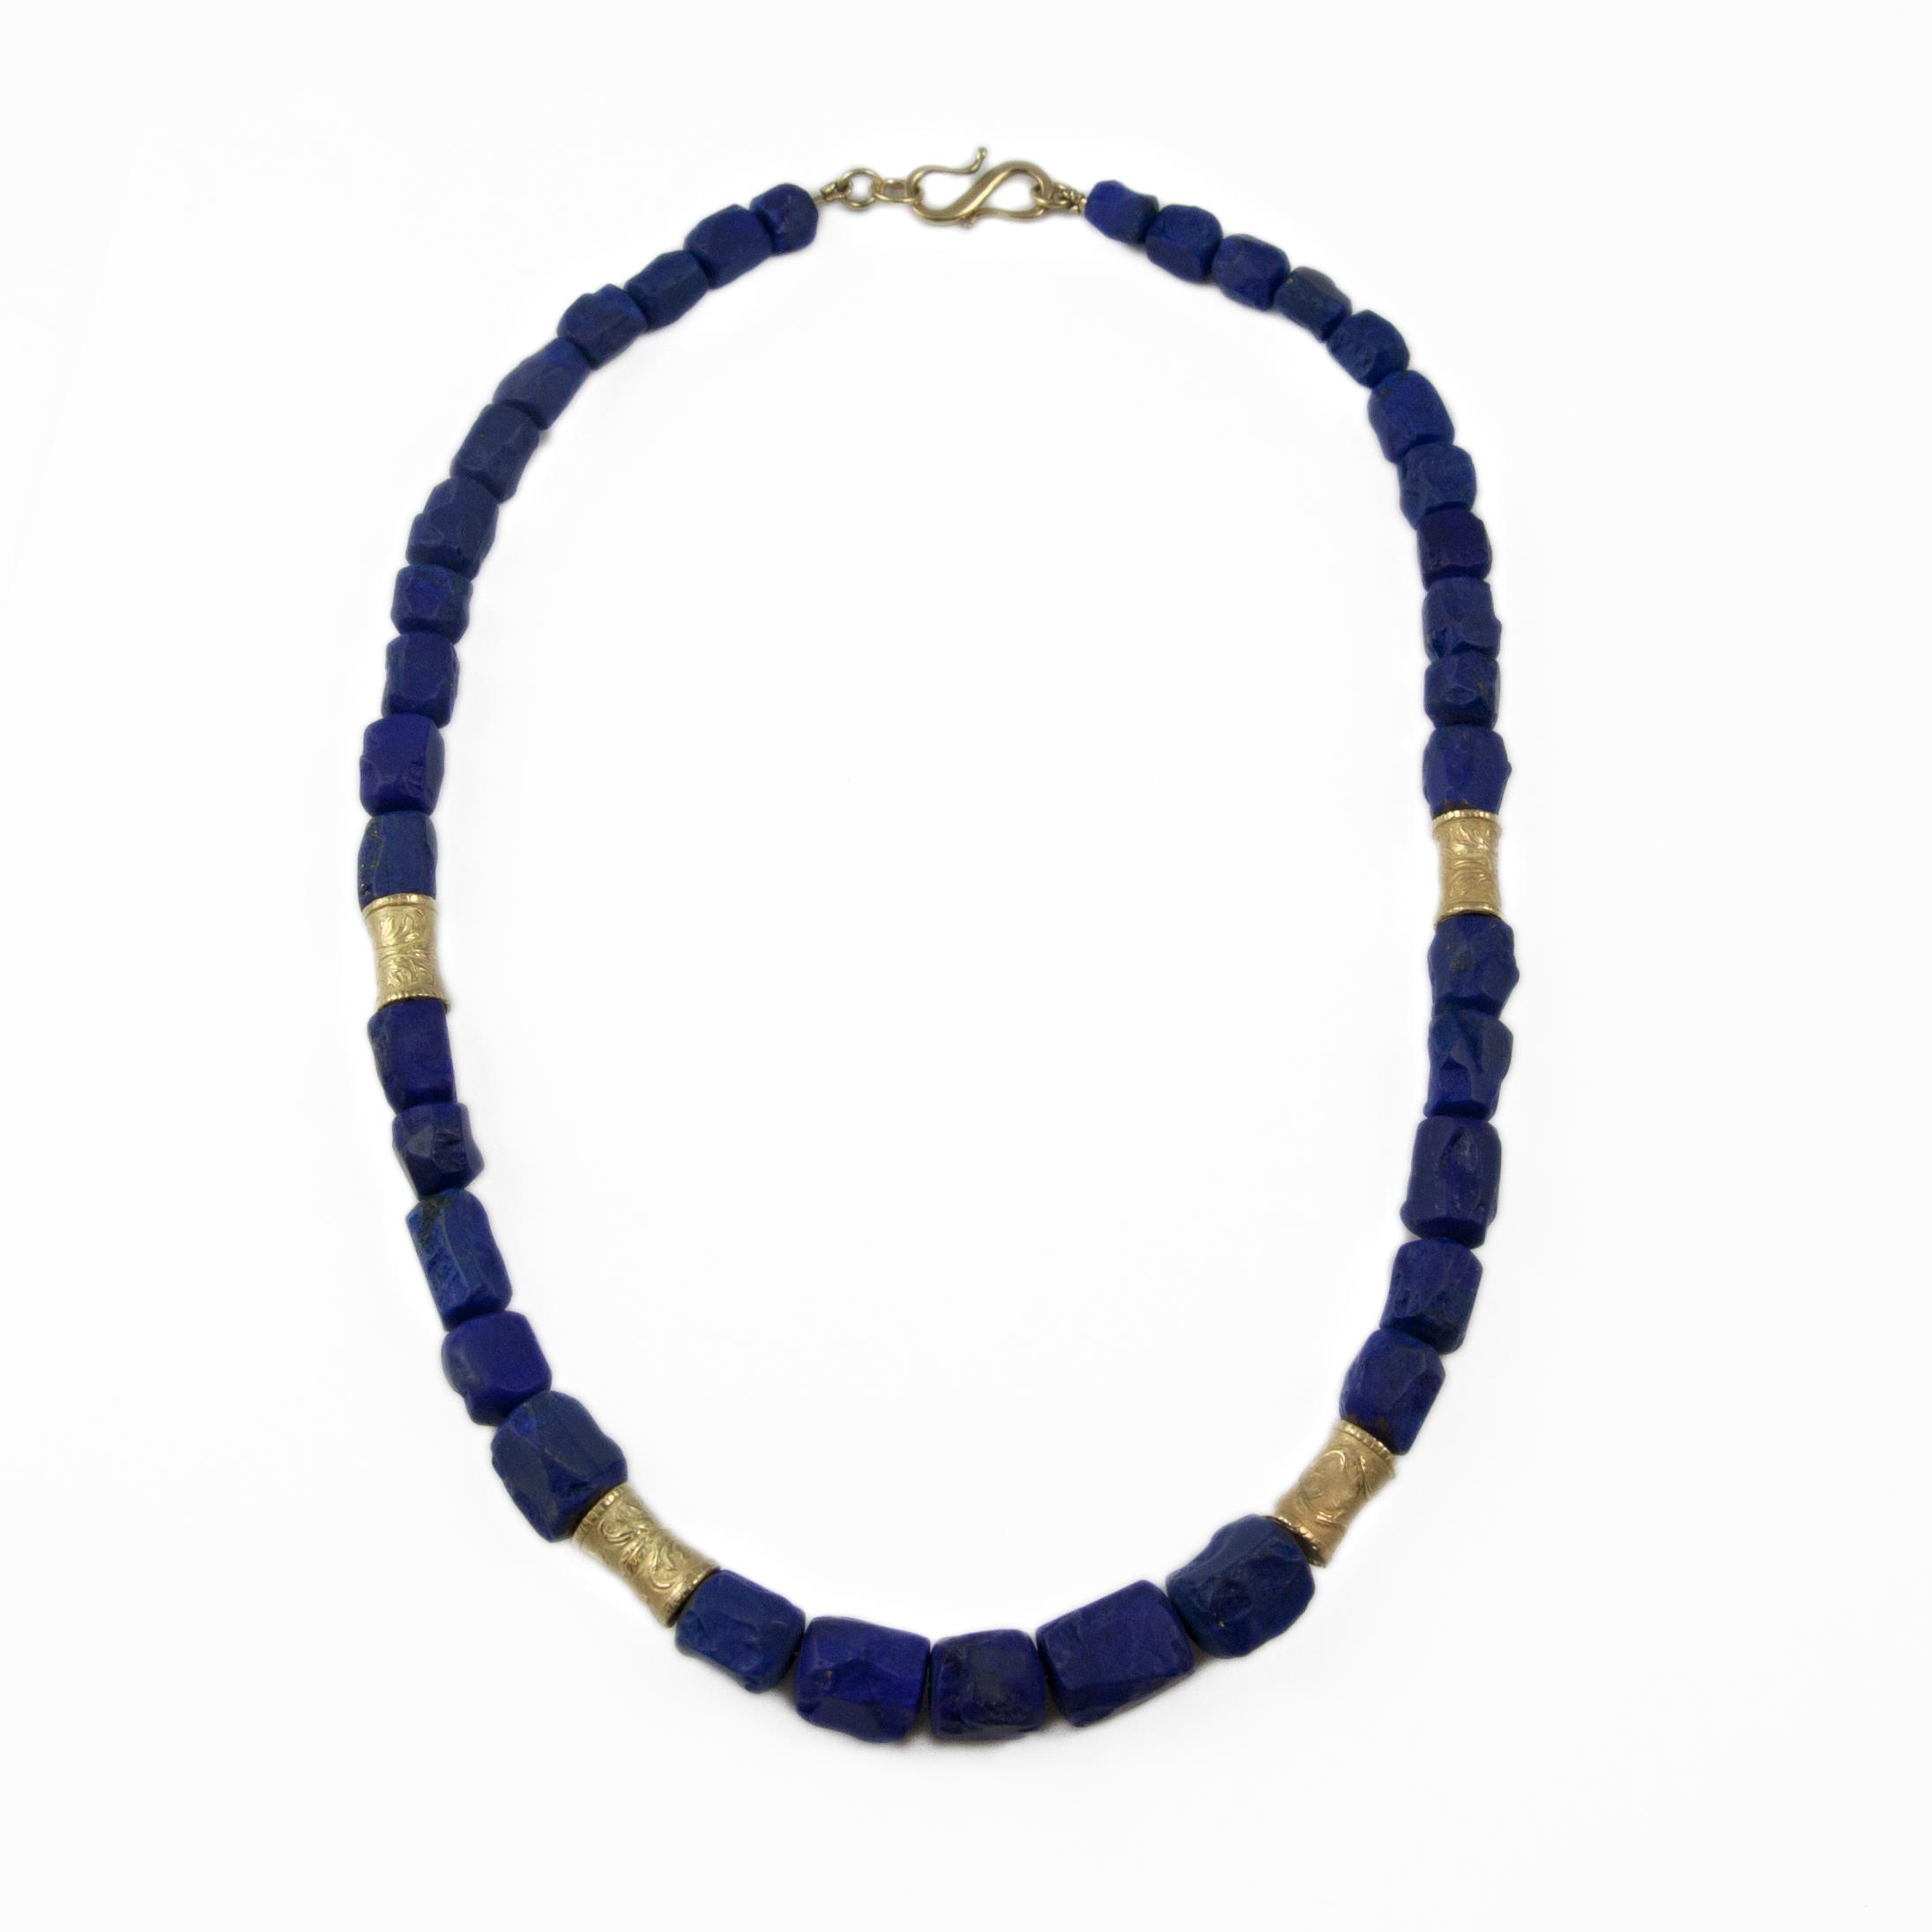 PATTERN lapis bead necklace full 3 (1 of 1).jpg